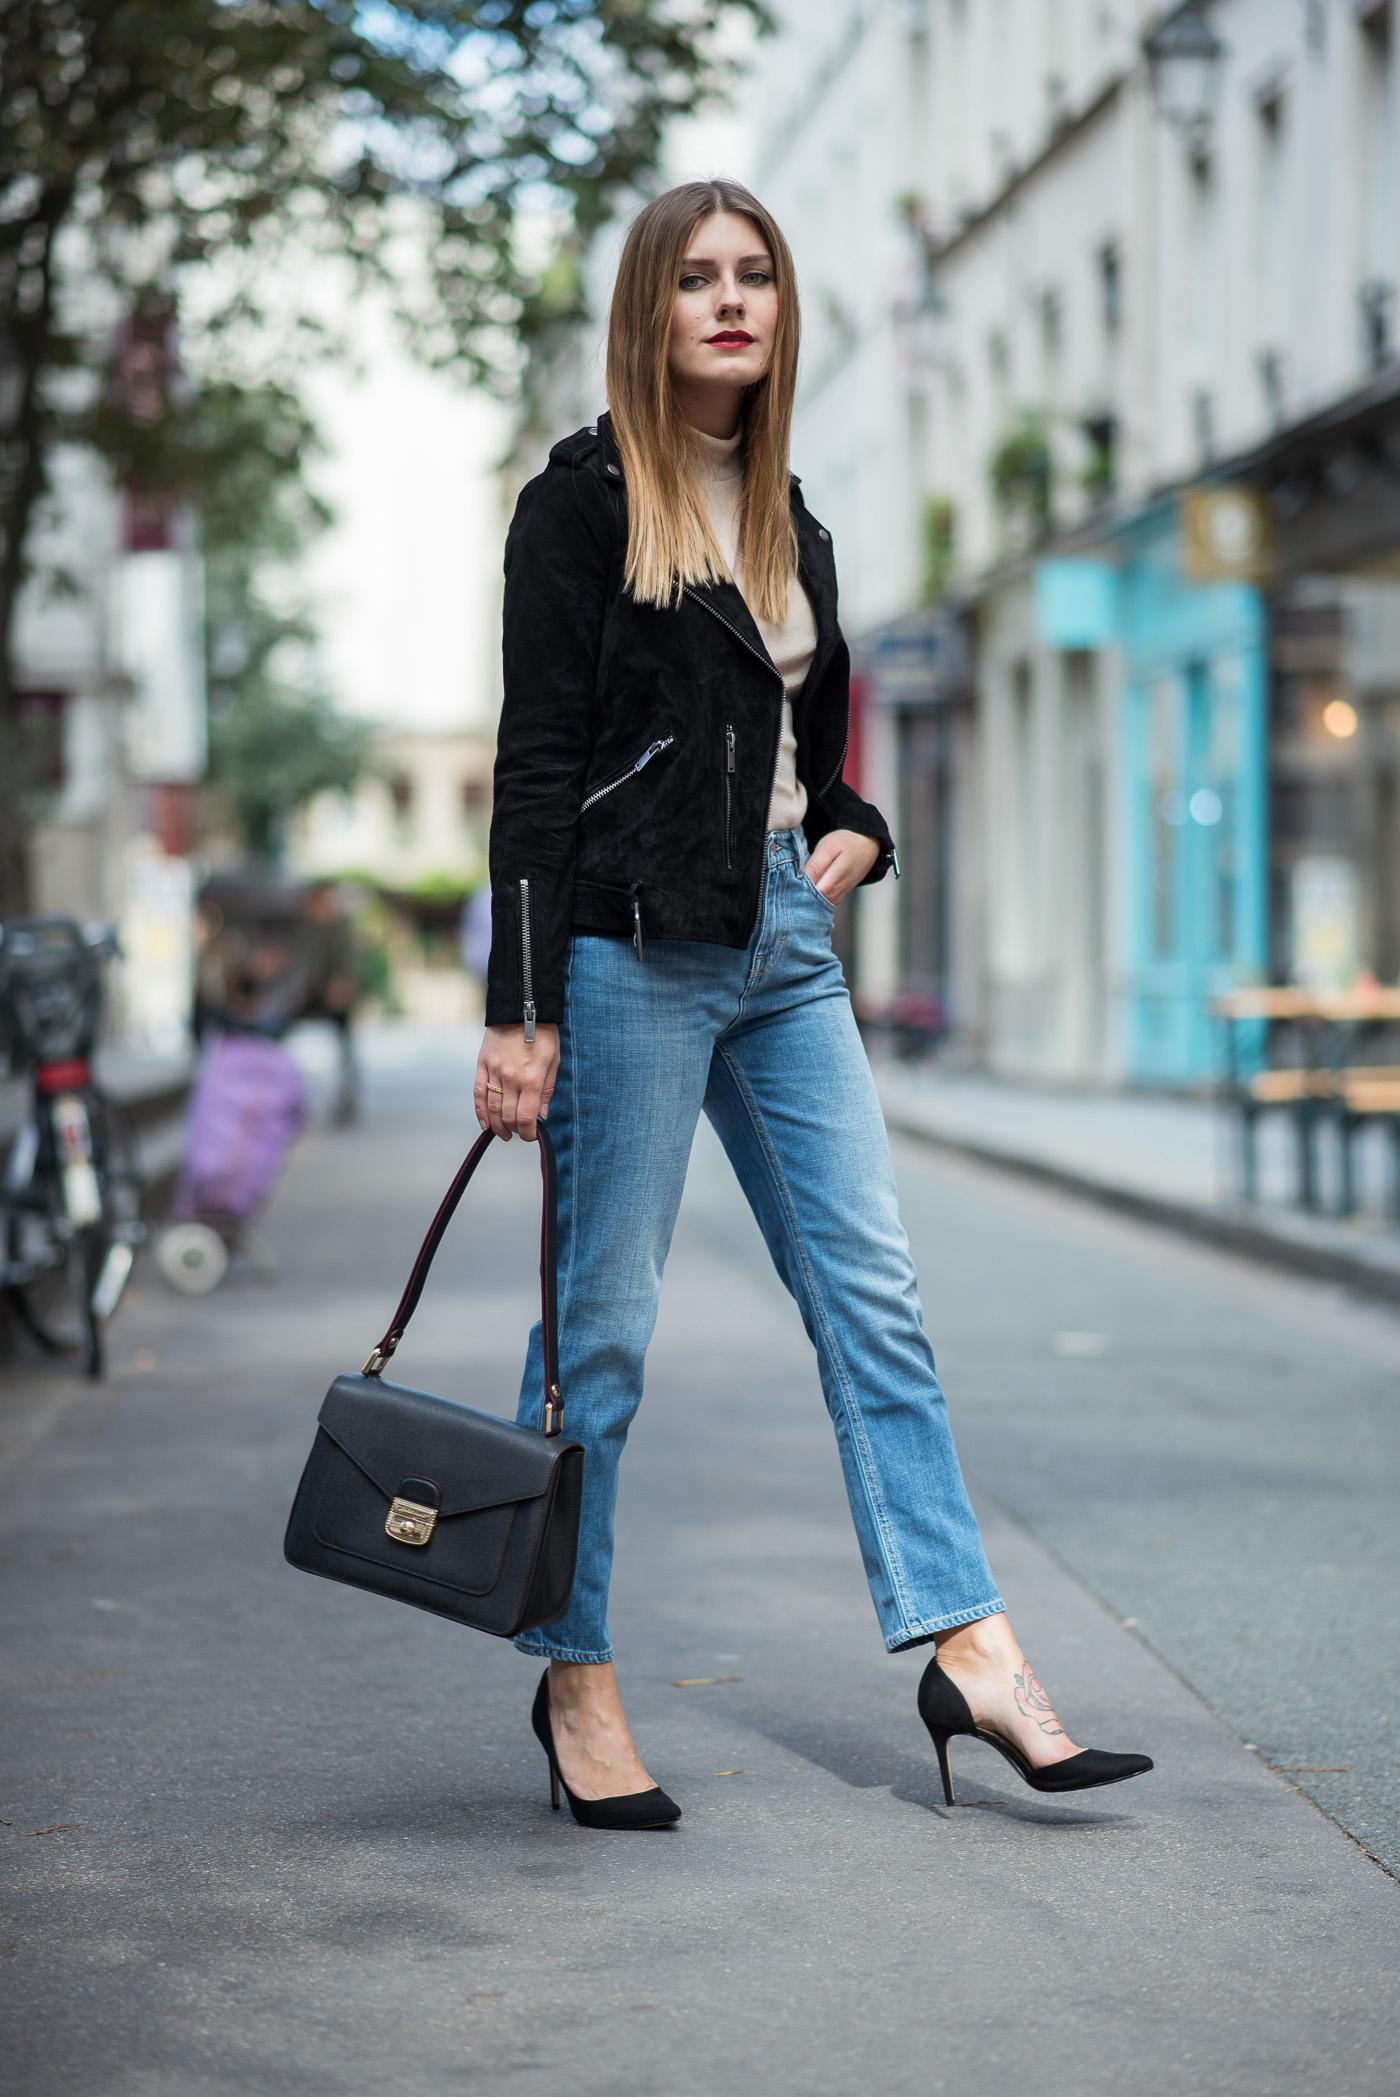 paris_fashion_week_leather_jacket_selected_femme_9